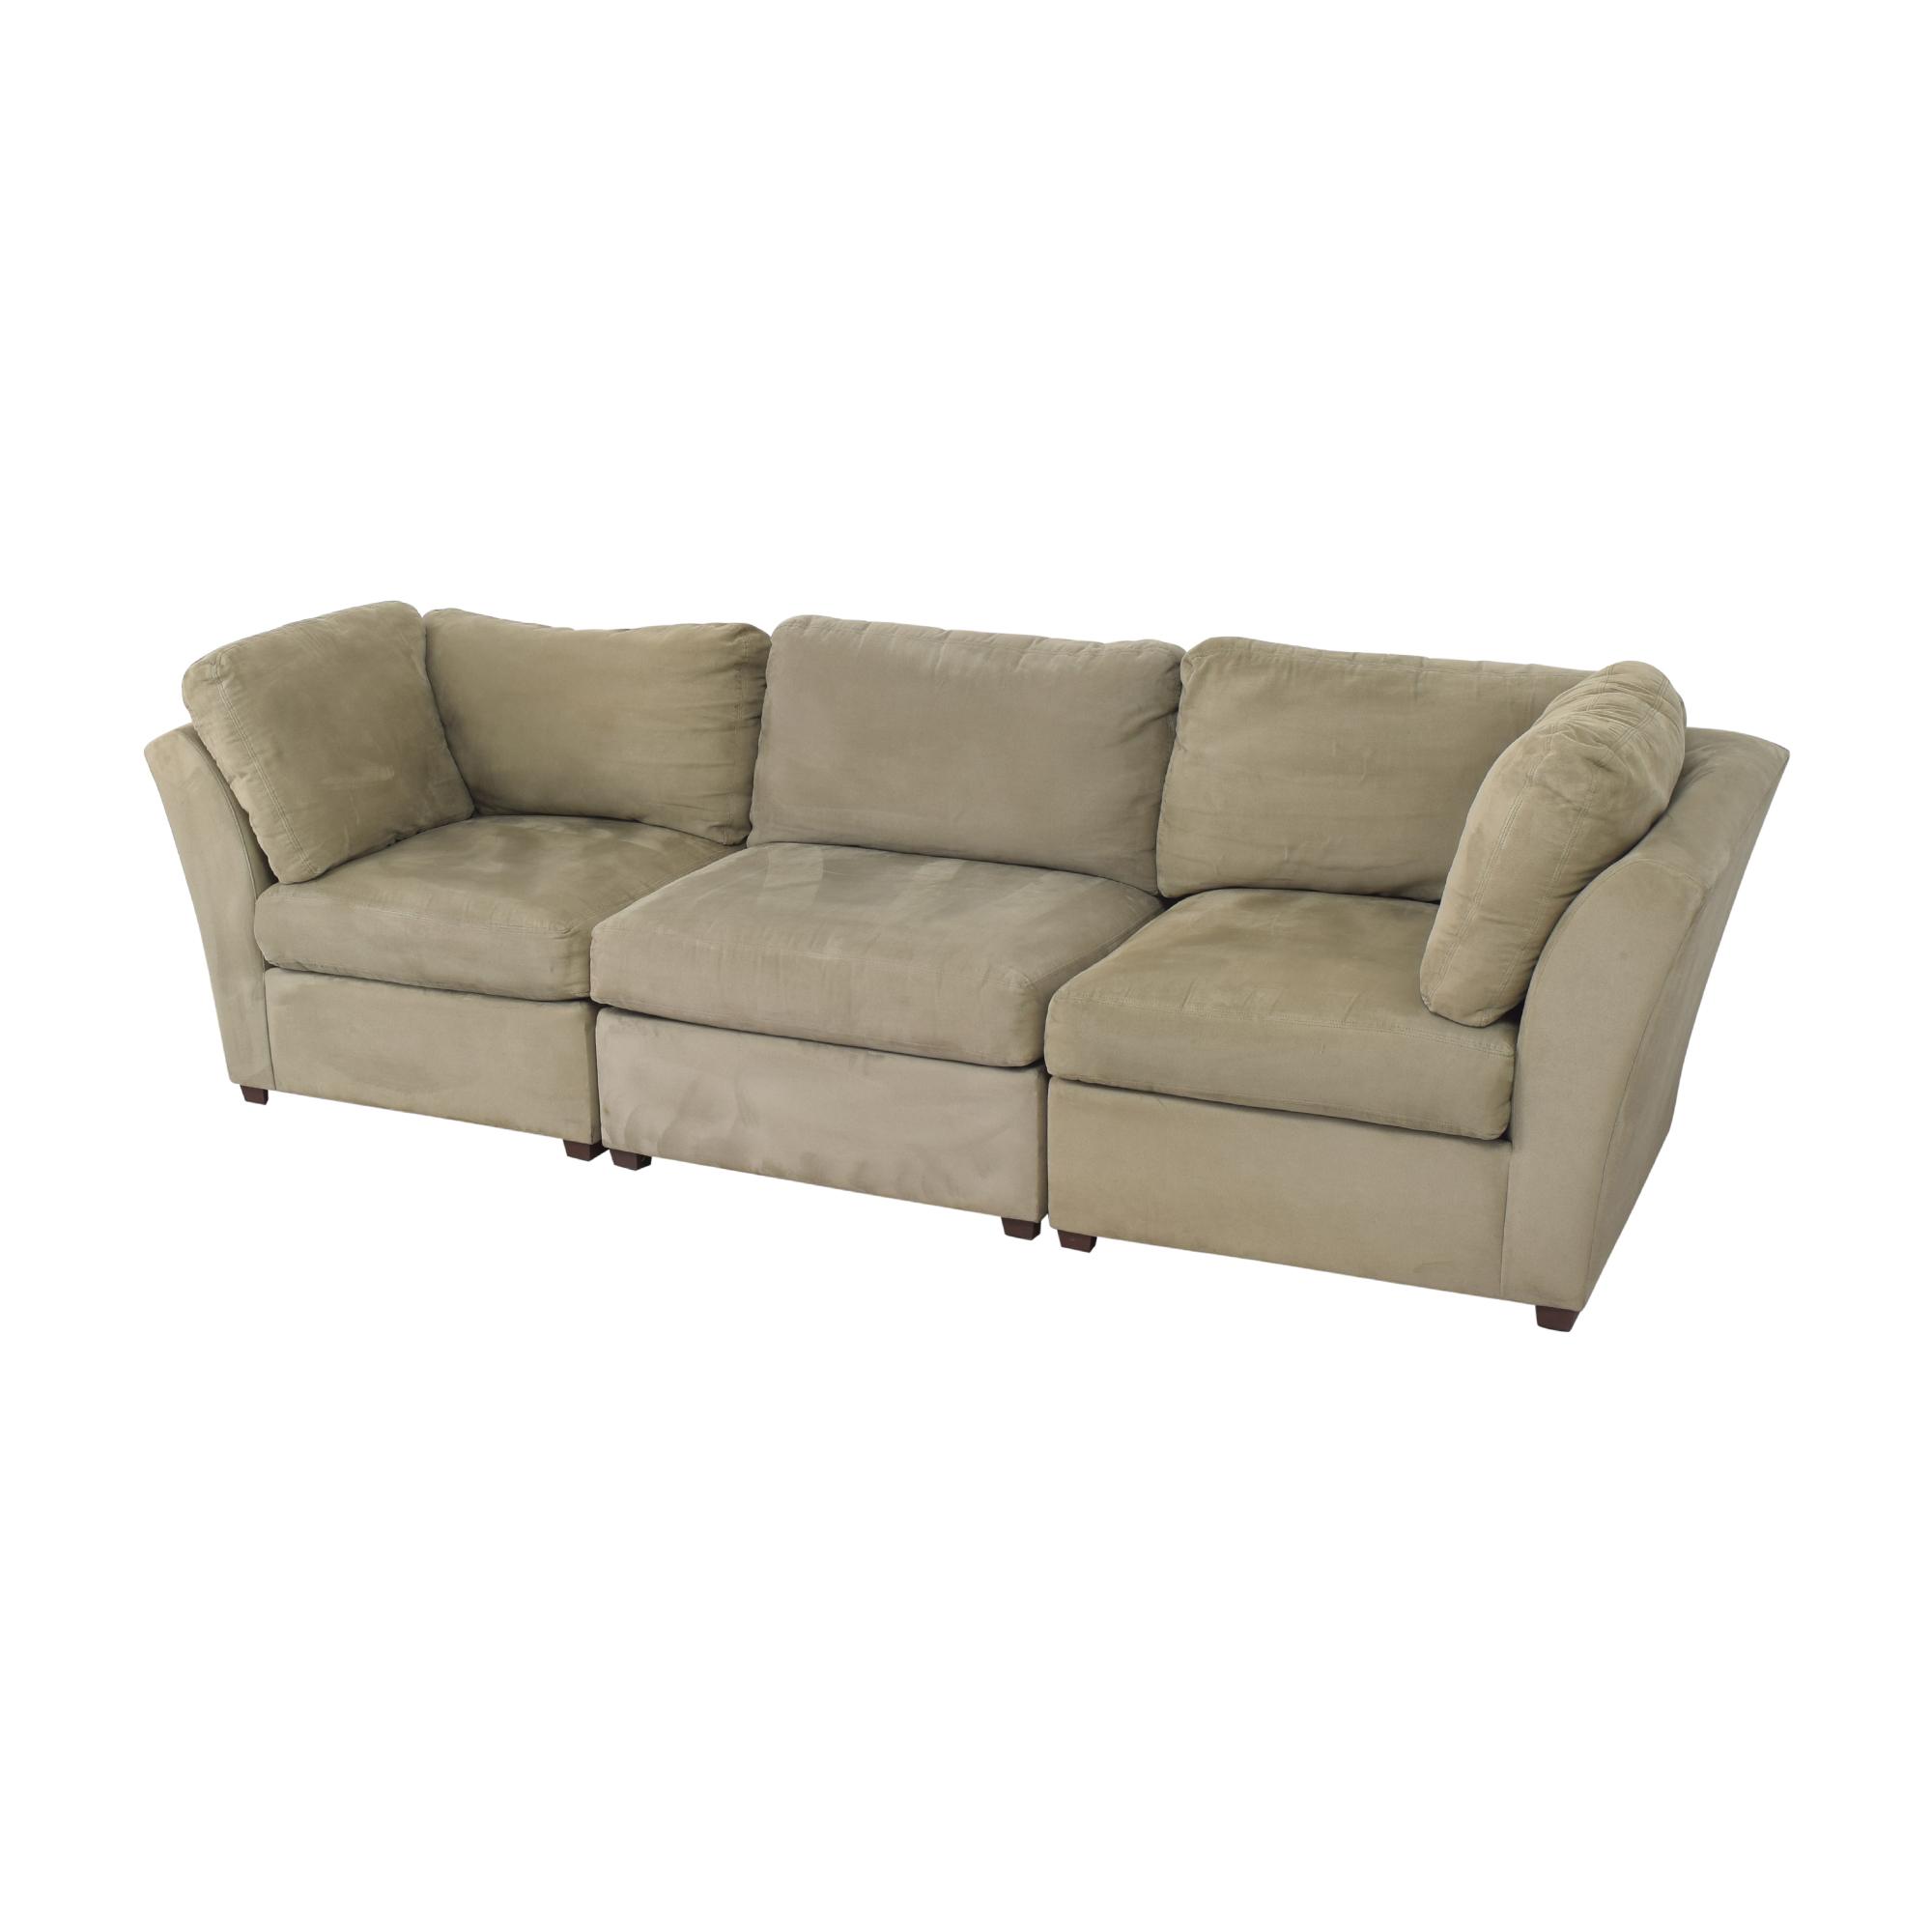 Raymour & Flanigan Raymour & Flanigan Modular Sofa green